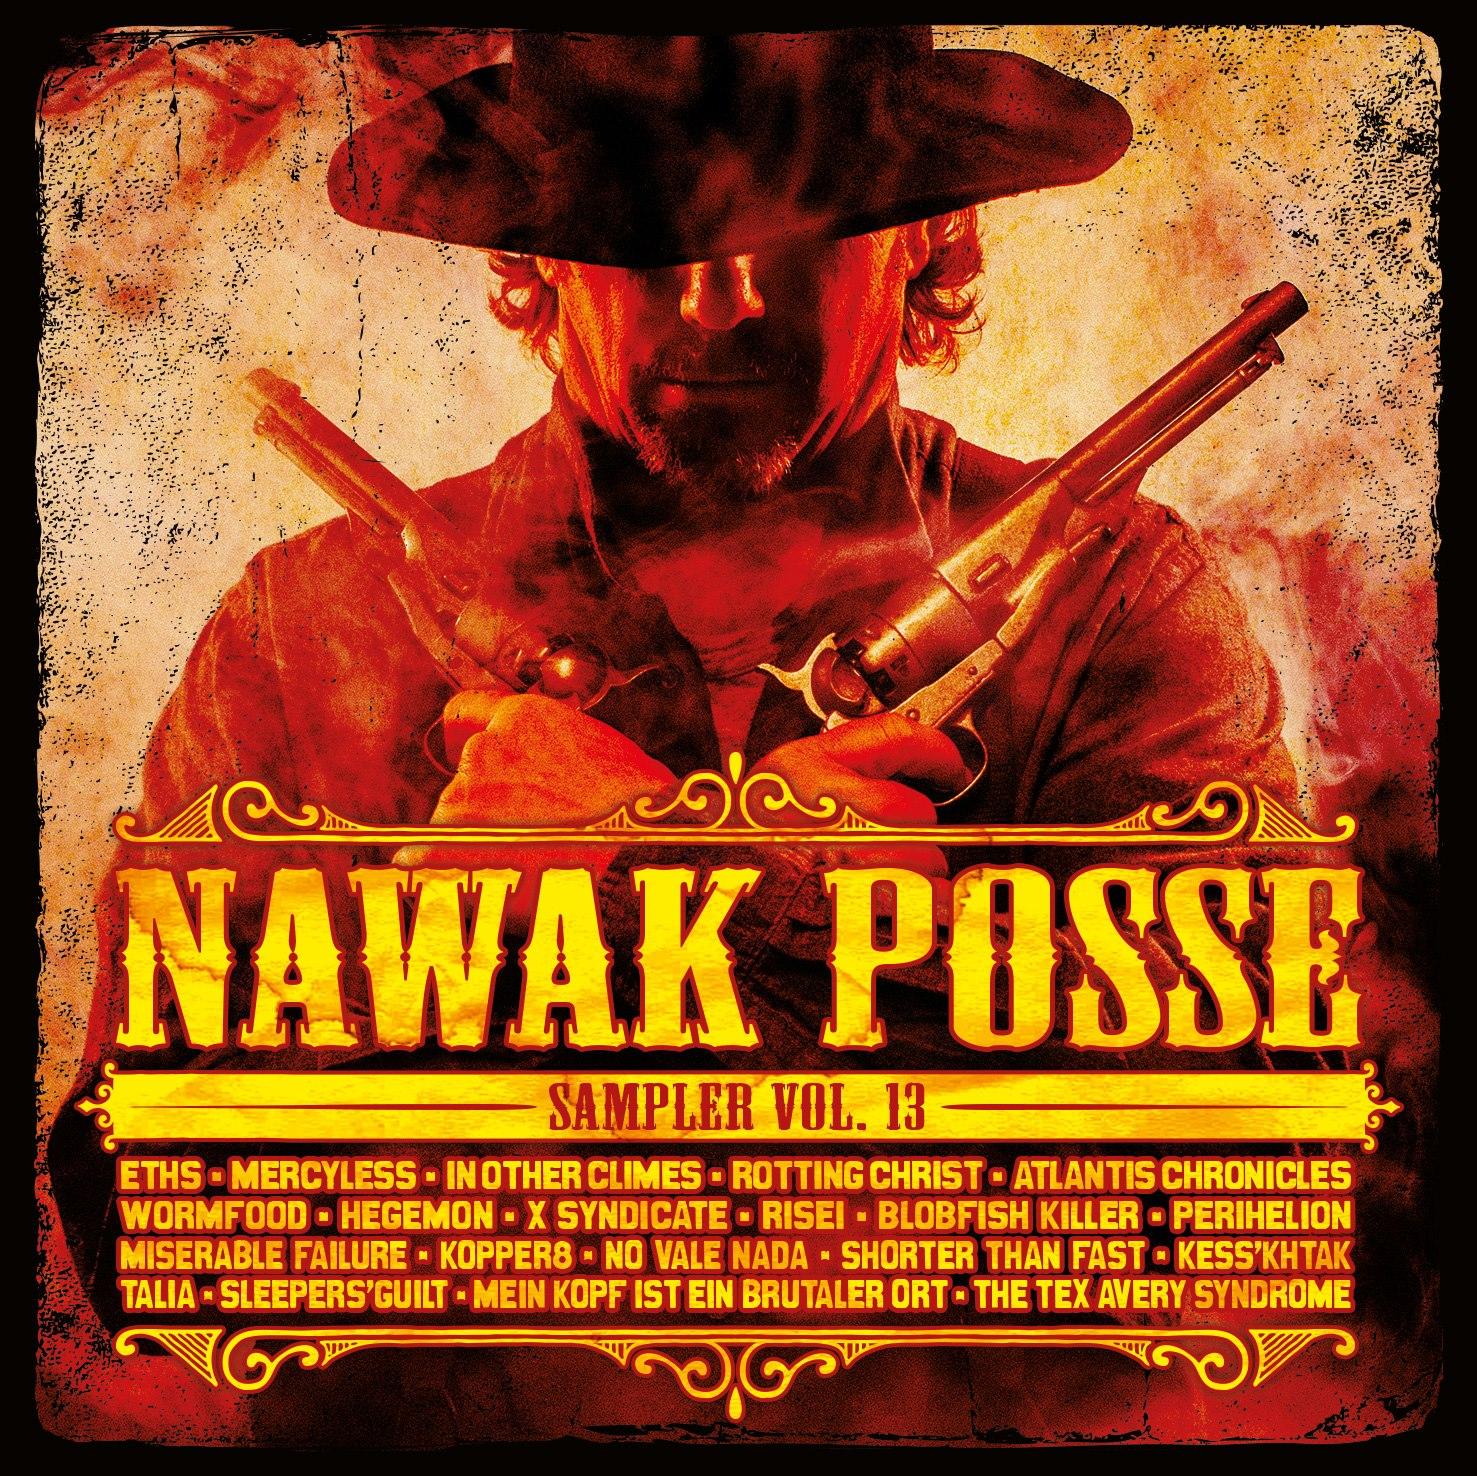 Nawak Posse Sampler Vol. 13